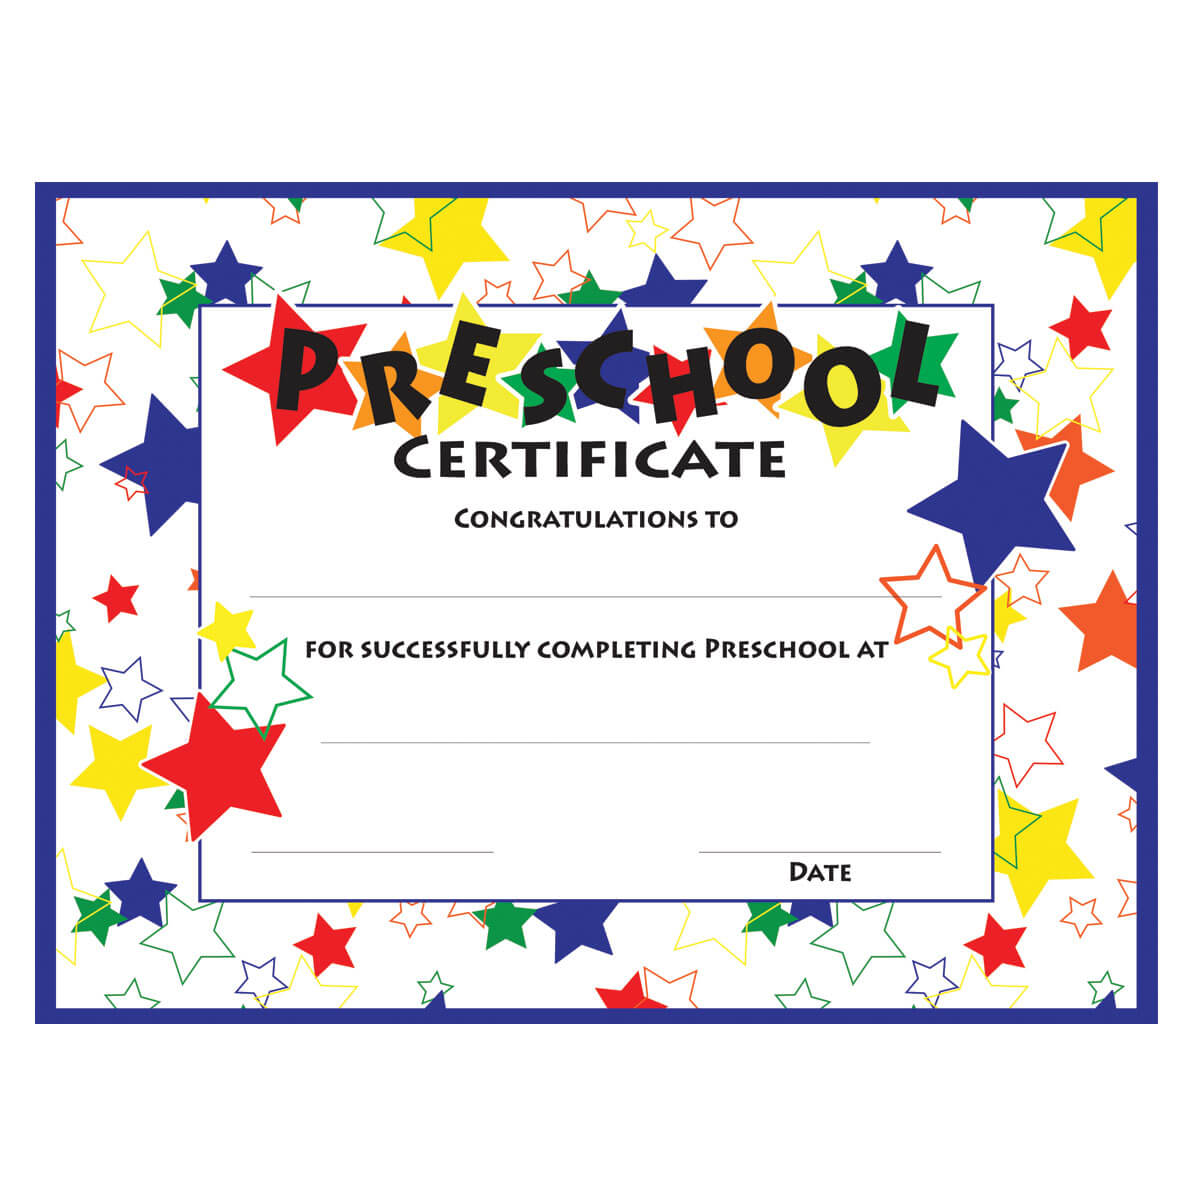 11+ Preschool Certificate Templates - Pdf | Free & Premium throughout Free School Certificate Templates